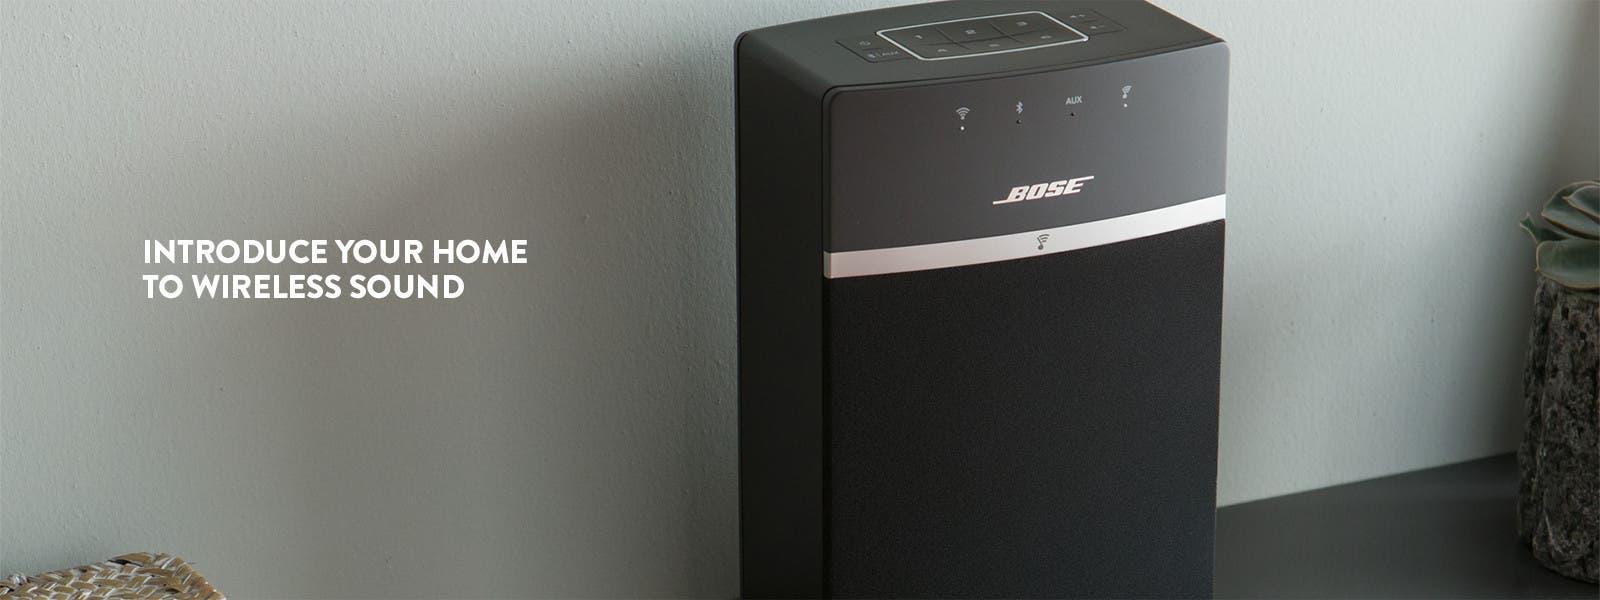 Bose SoundTouch 10 wireless speaker system.